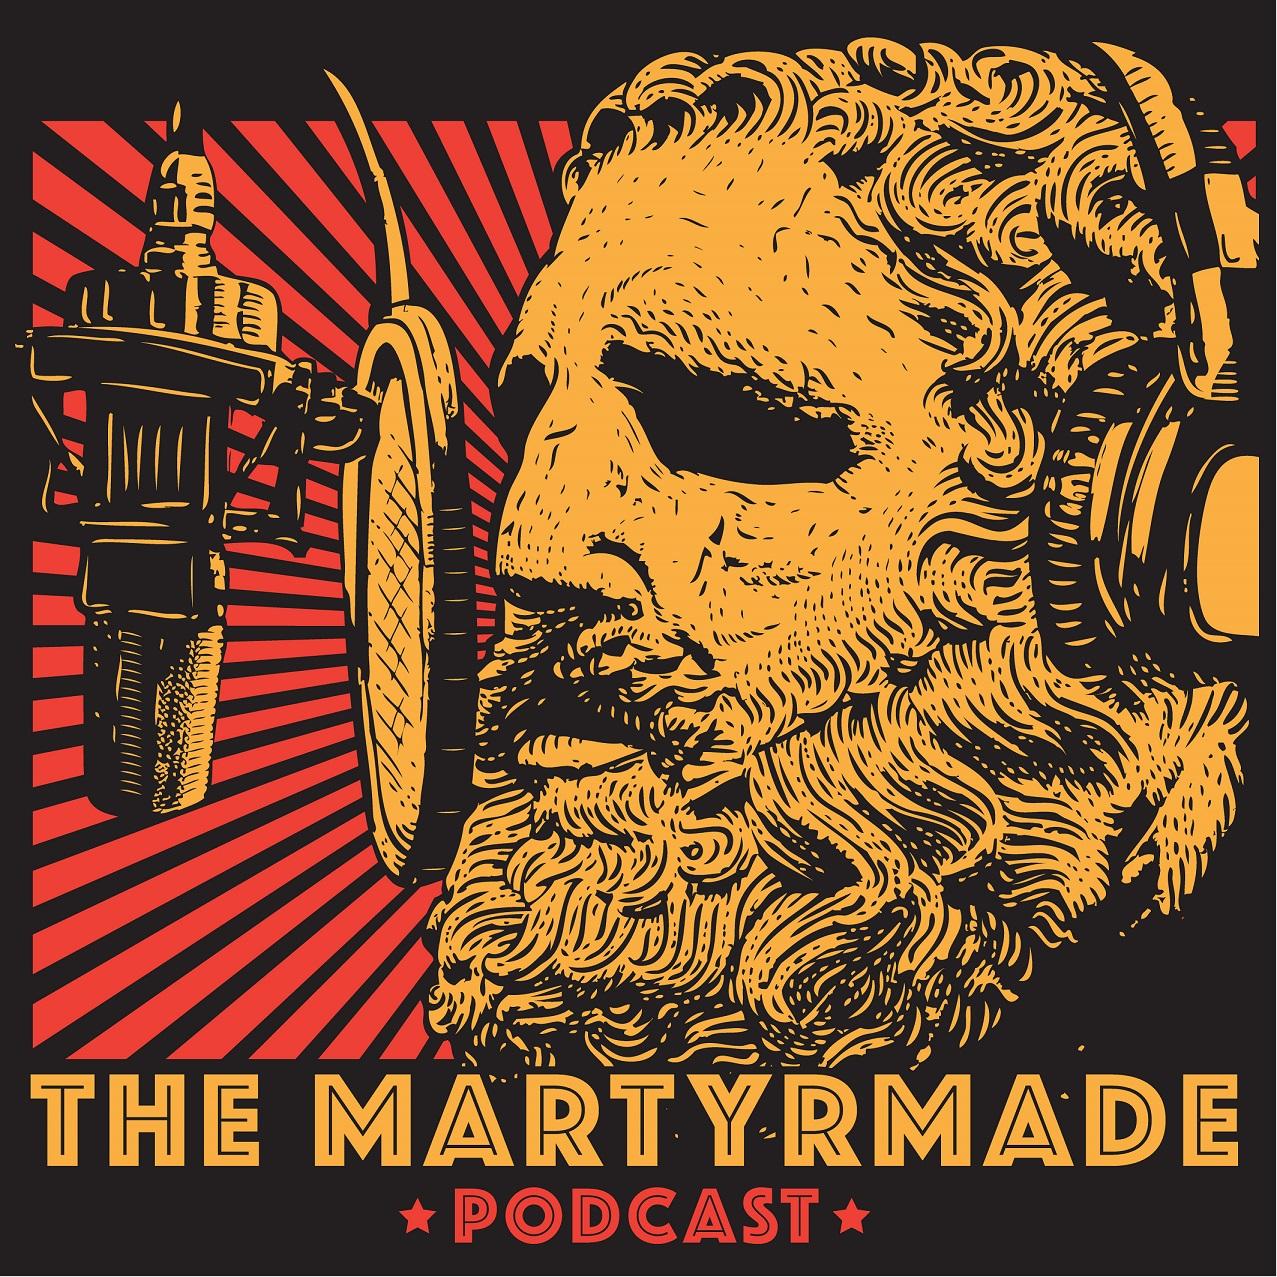 MartyrMade